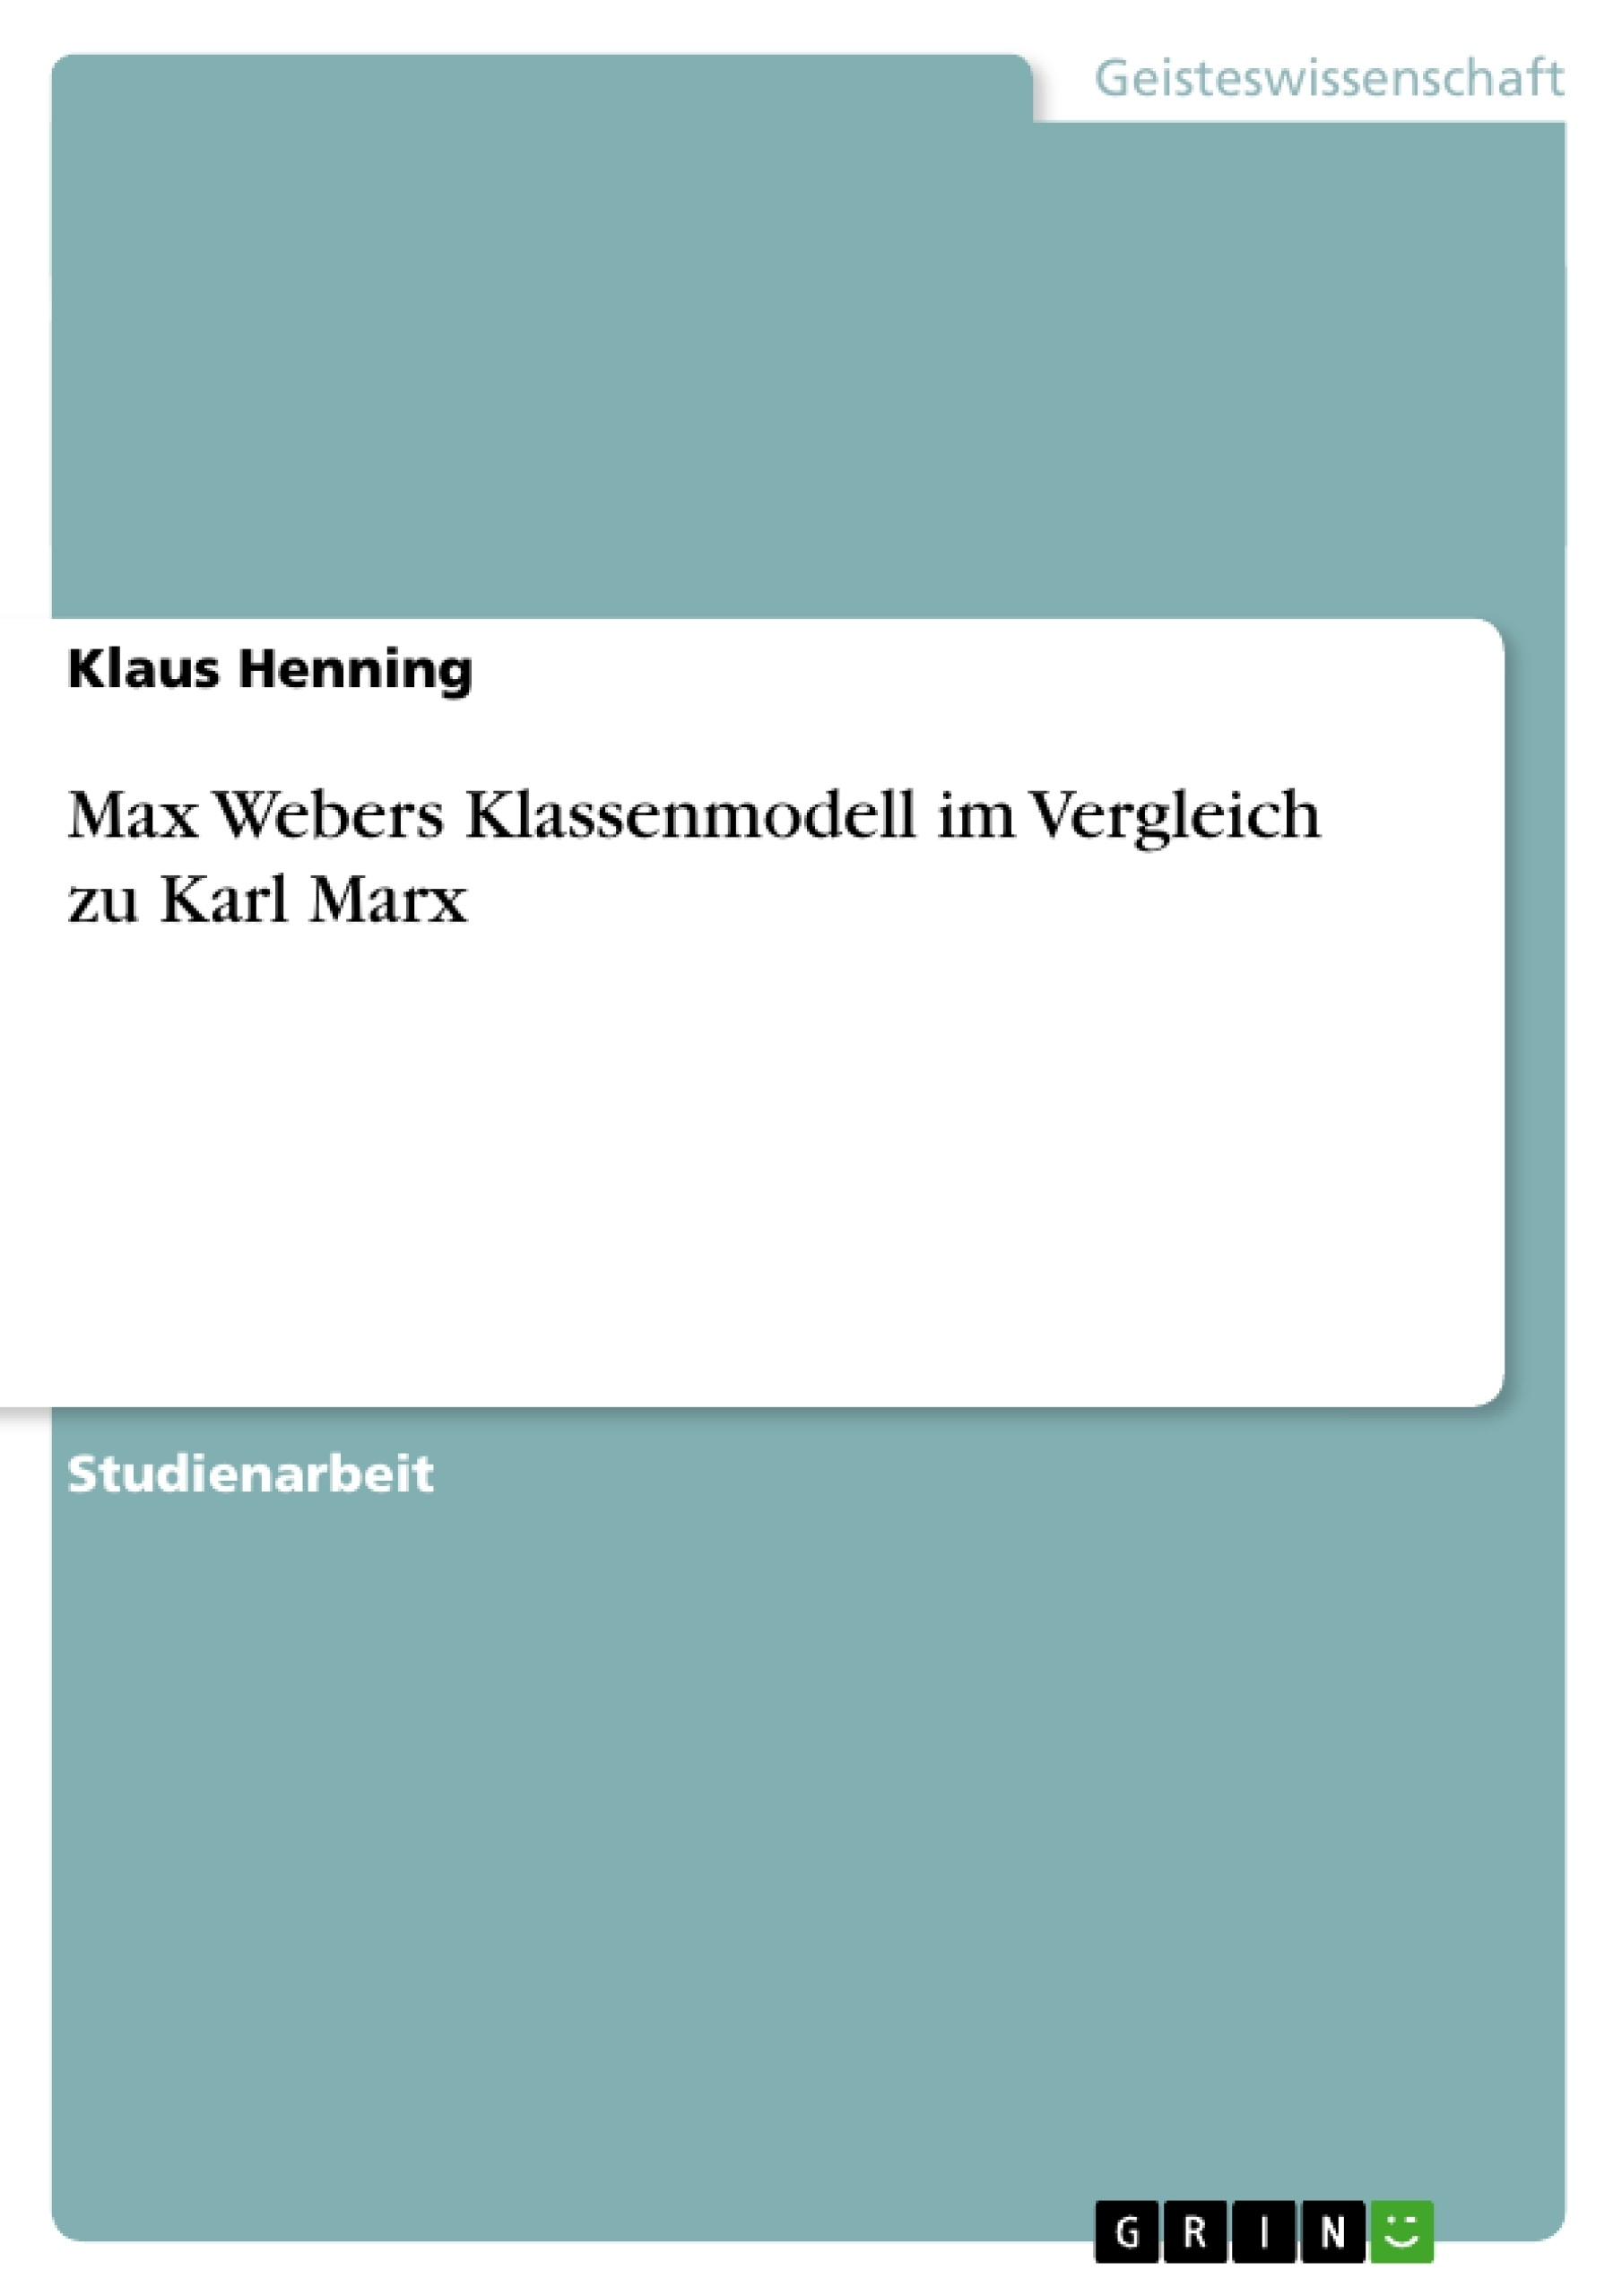 Titel: Max Webers Klassenmodell im Vergleich zu Karl Marx